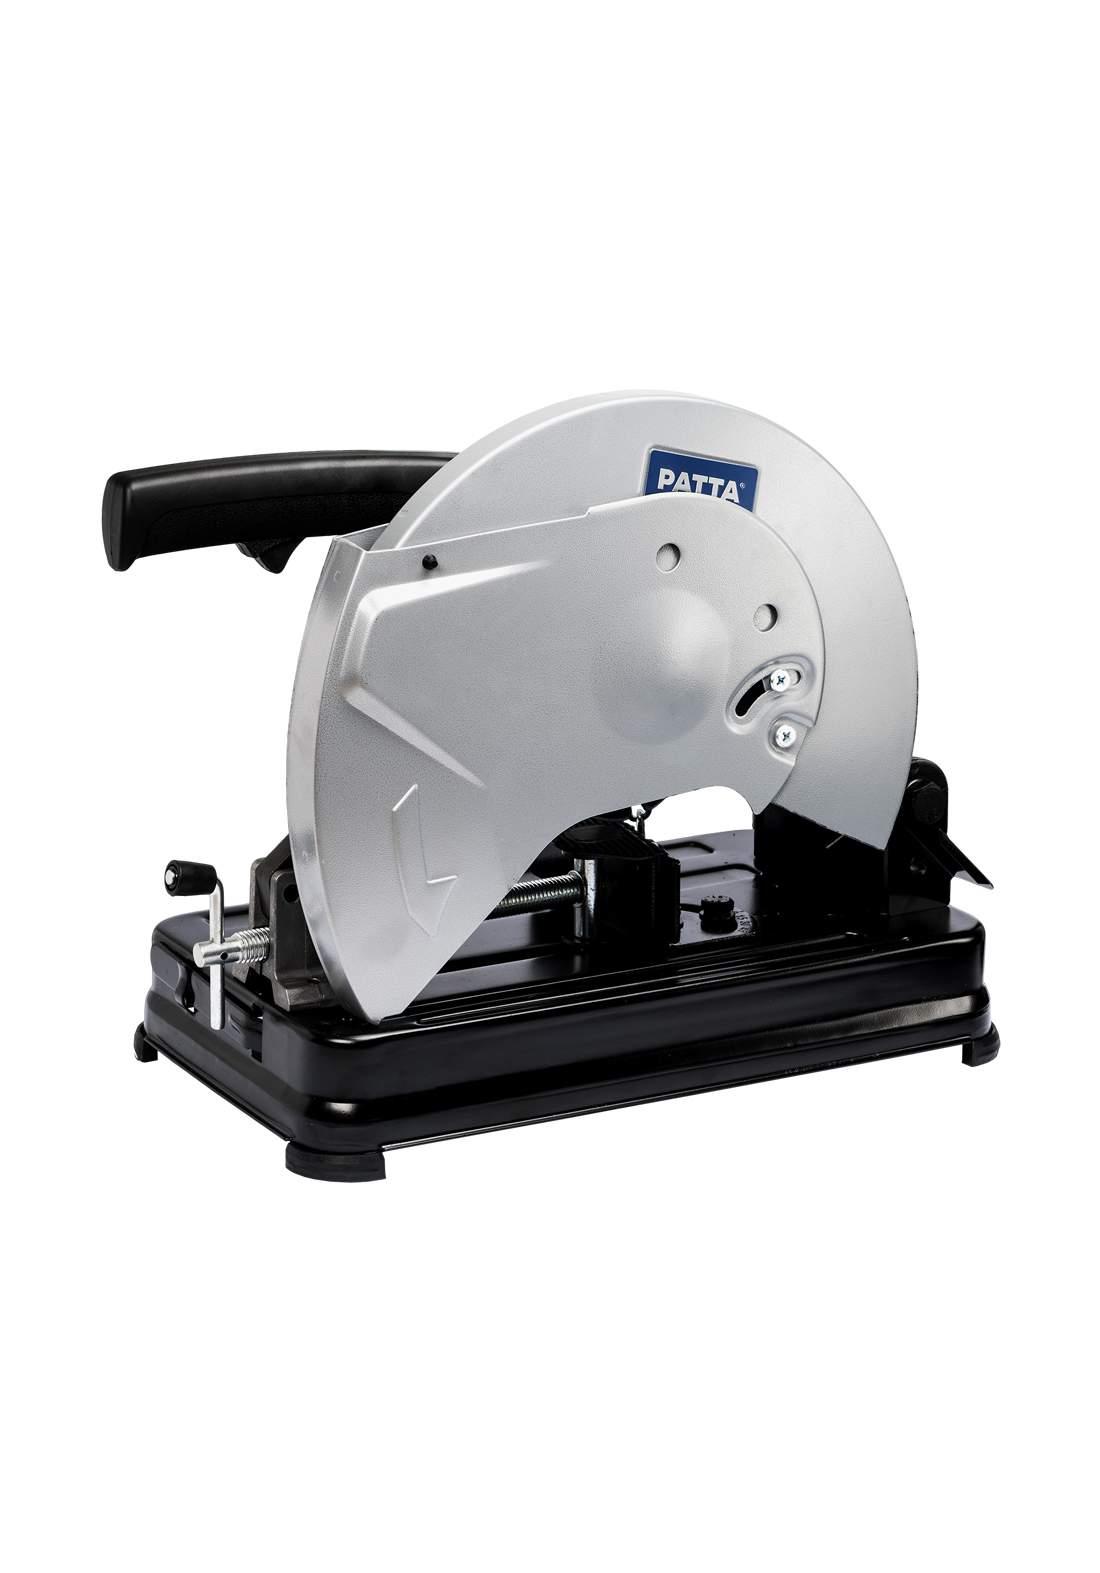 Patta ASC20-355 Electric Cut-off Machine 2000 W 355 mm  منشار كهربائي منضدي